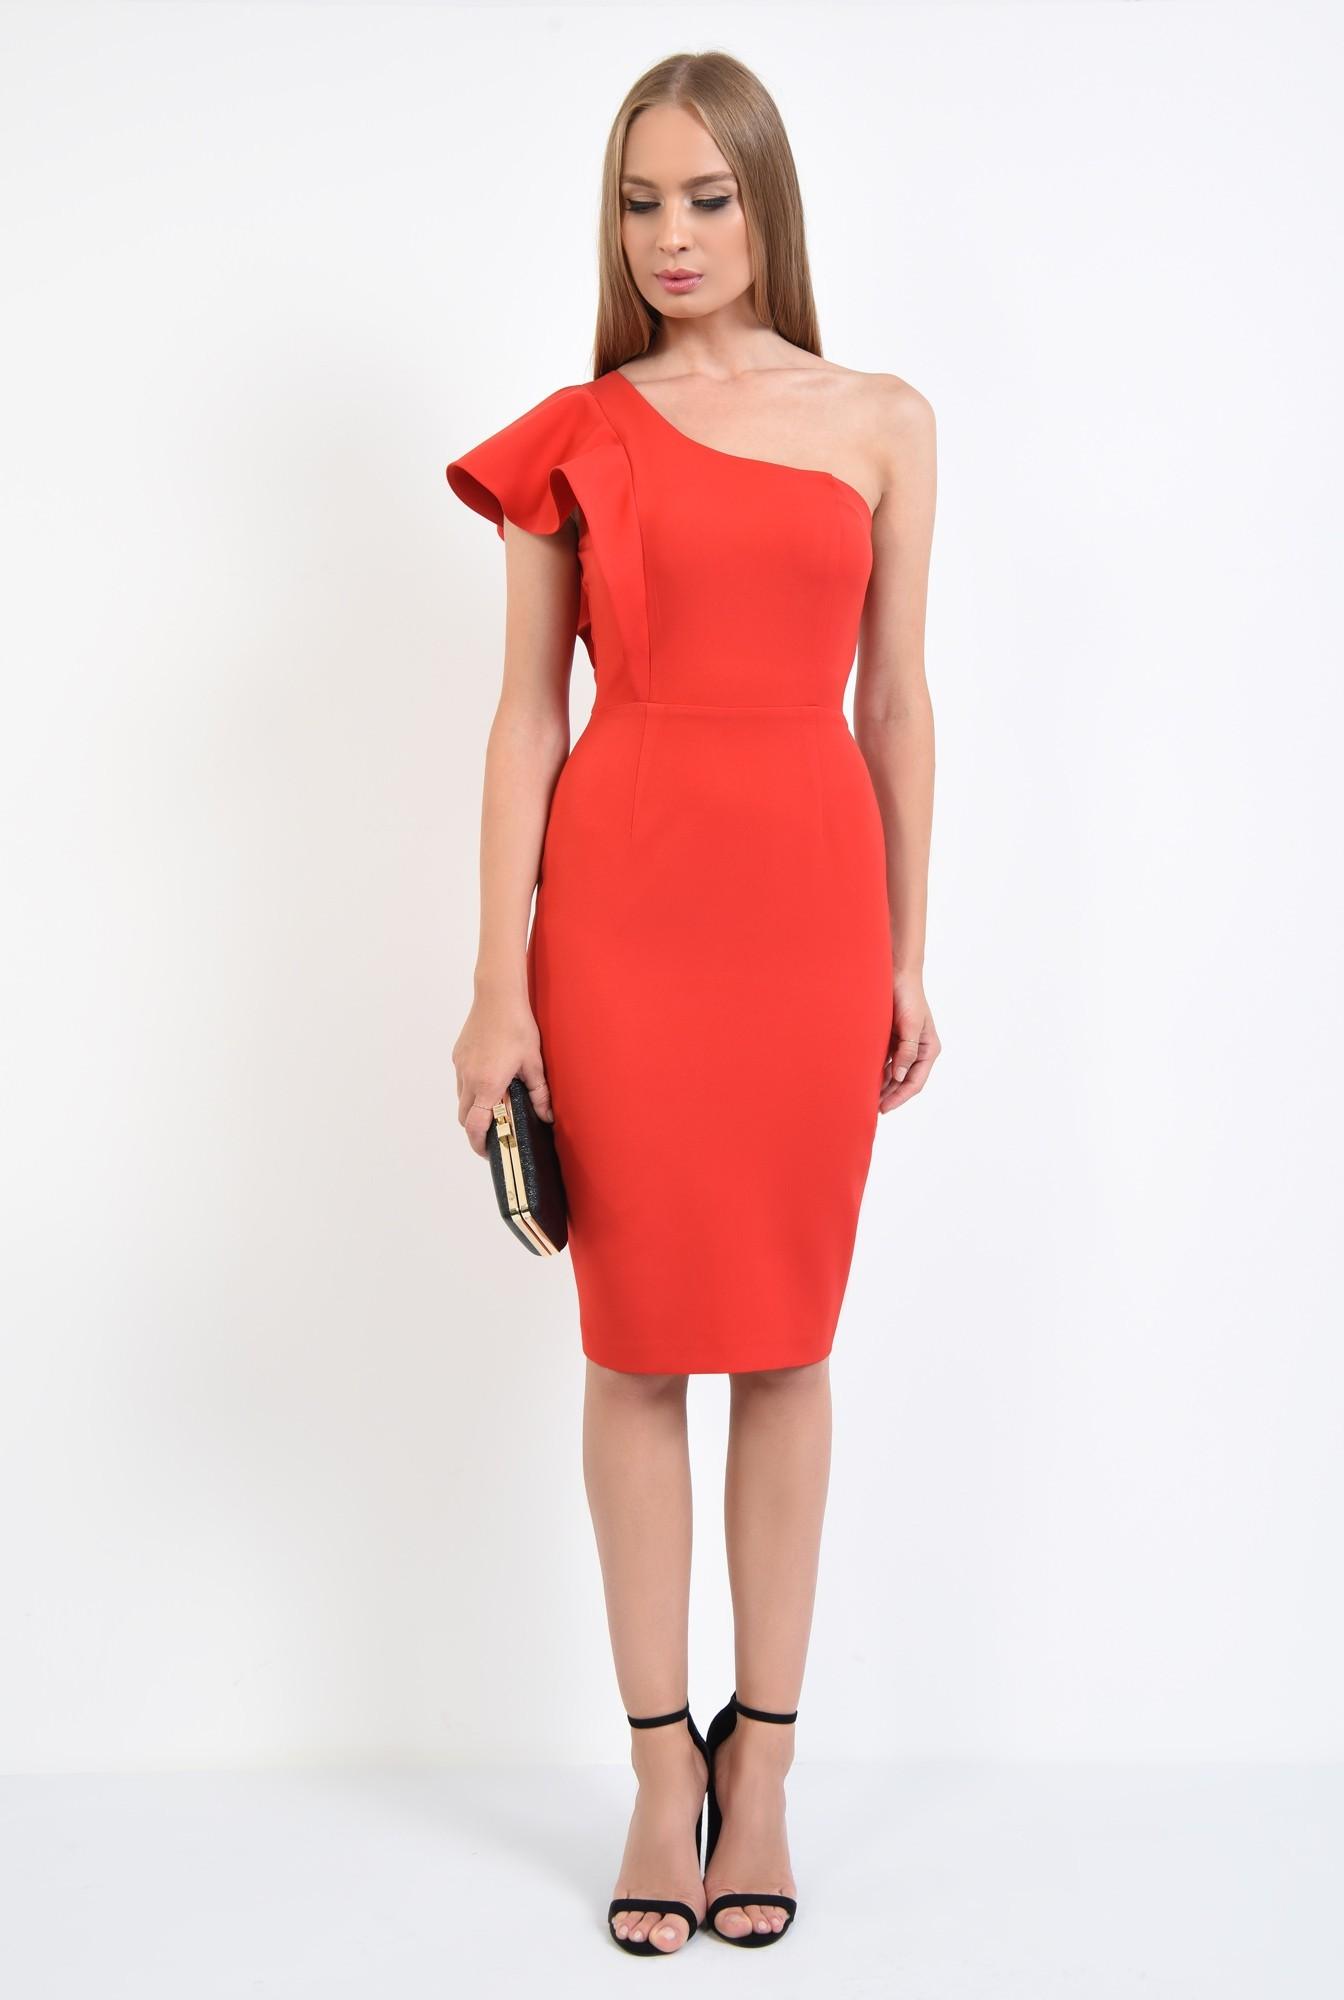 3 - rochie de ocazie, cambrata, slit la spate, rochii online